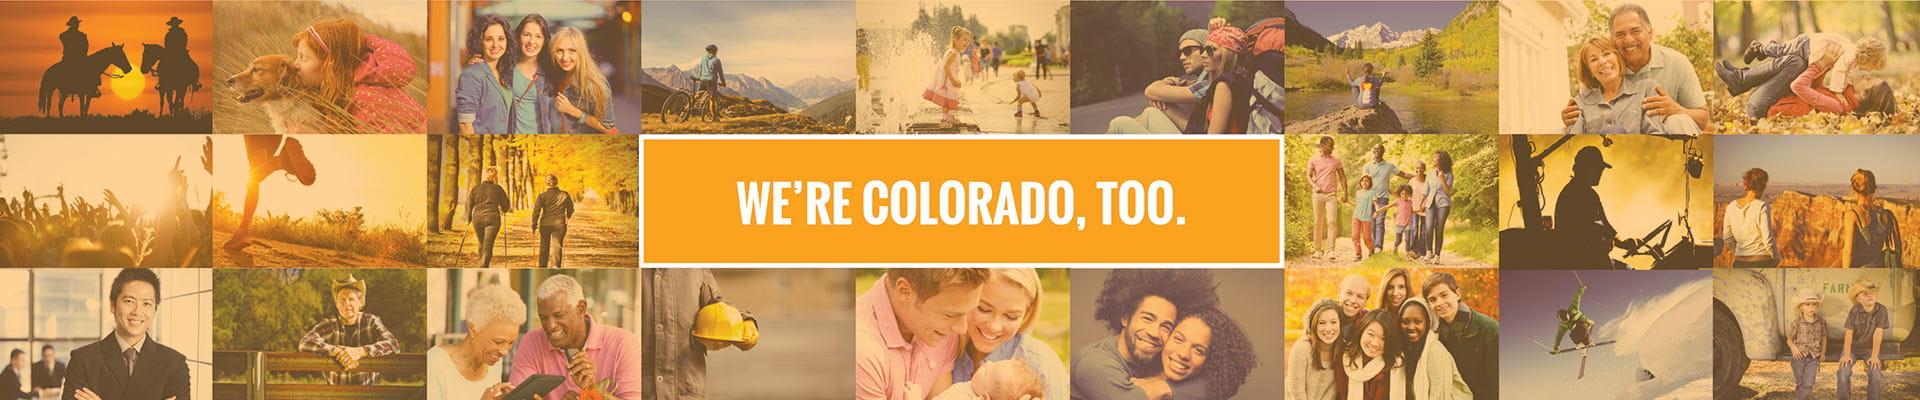 Colorado Health Insurance Plans - Rocky Mountain Health Plans